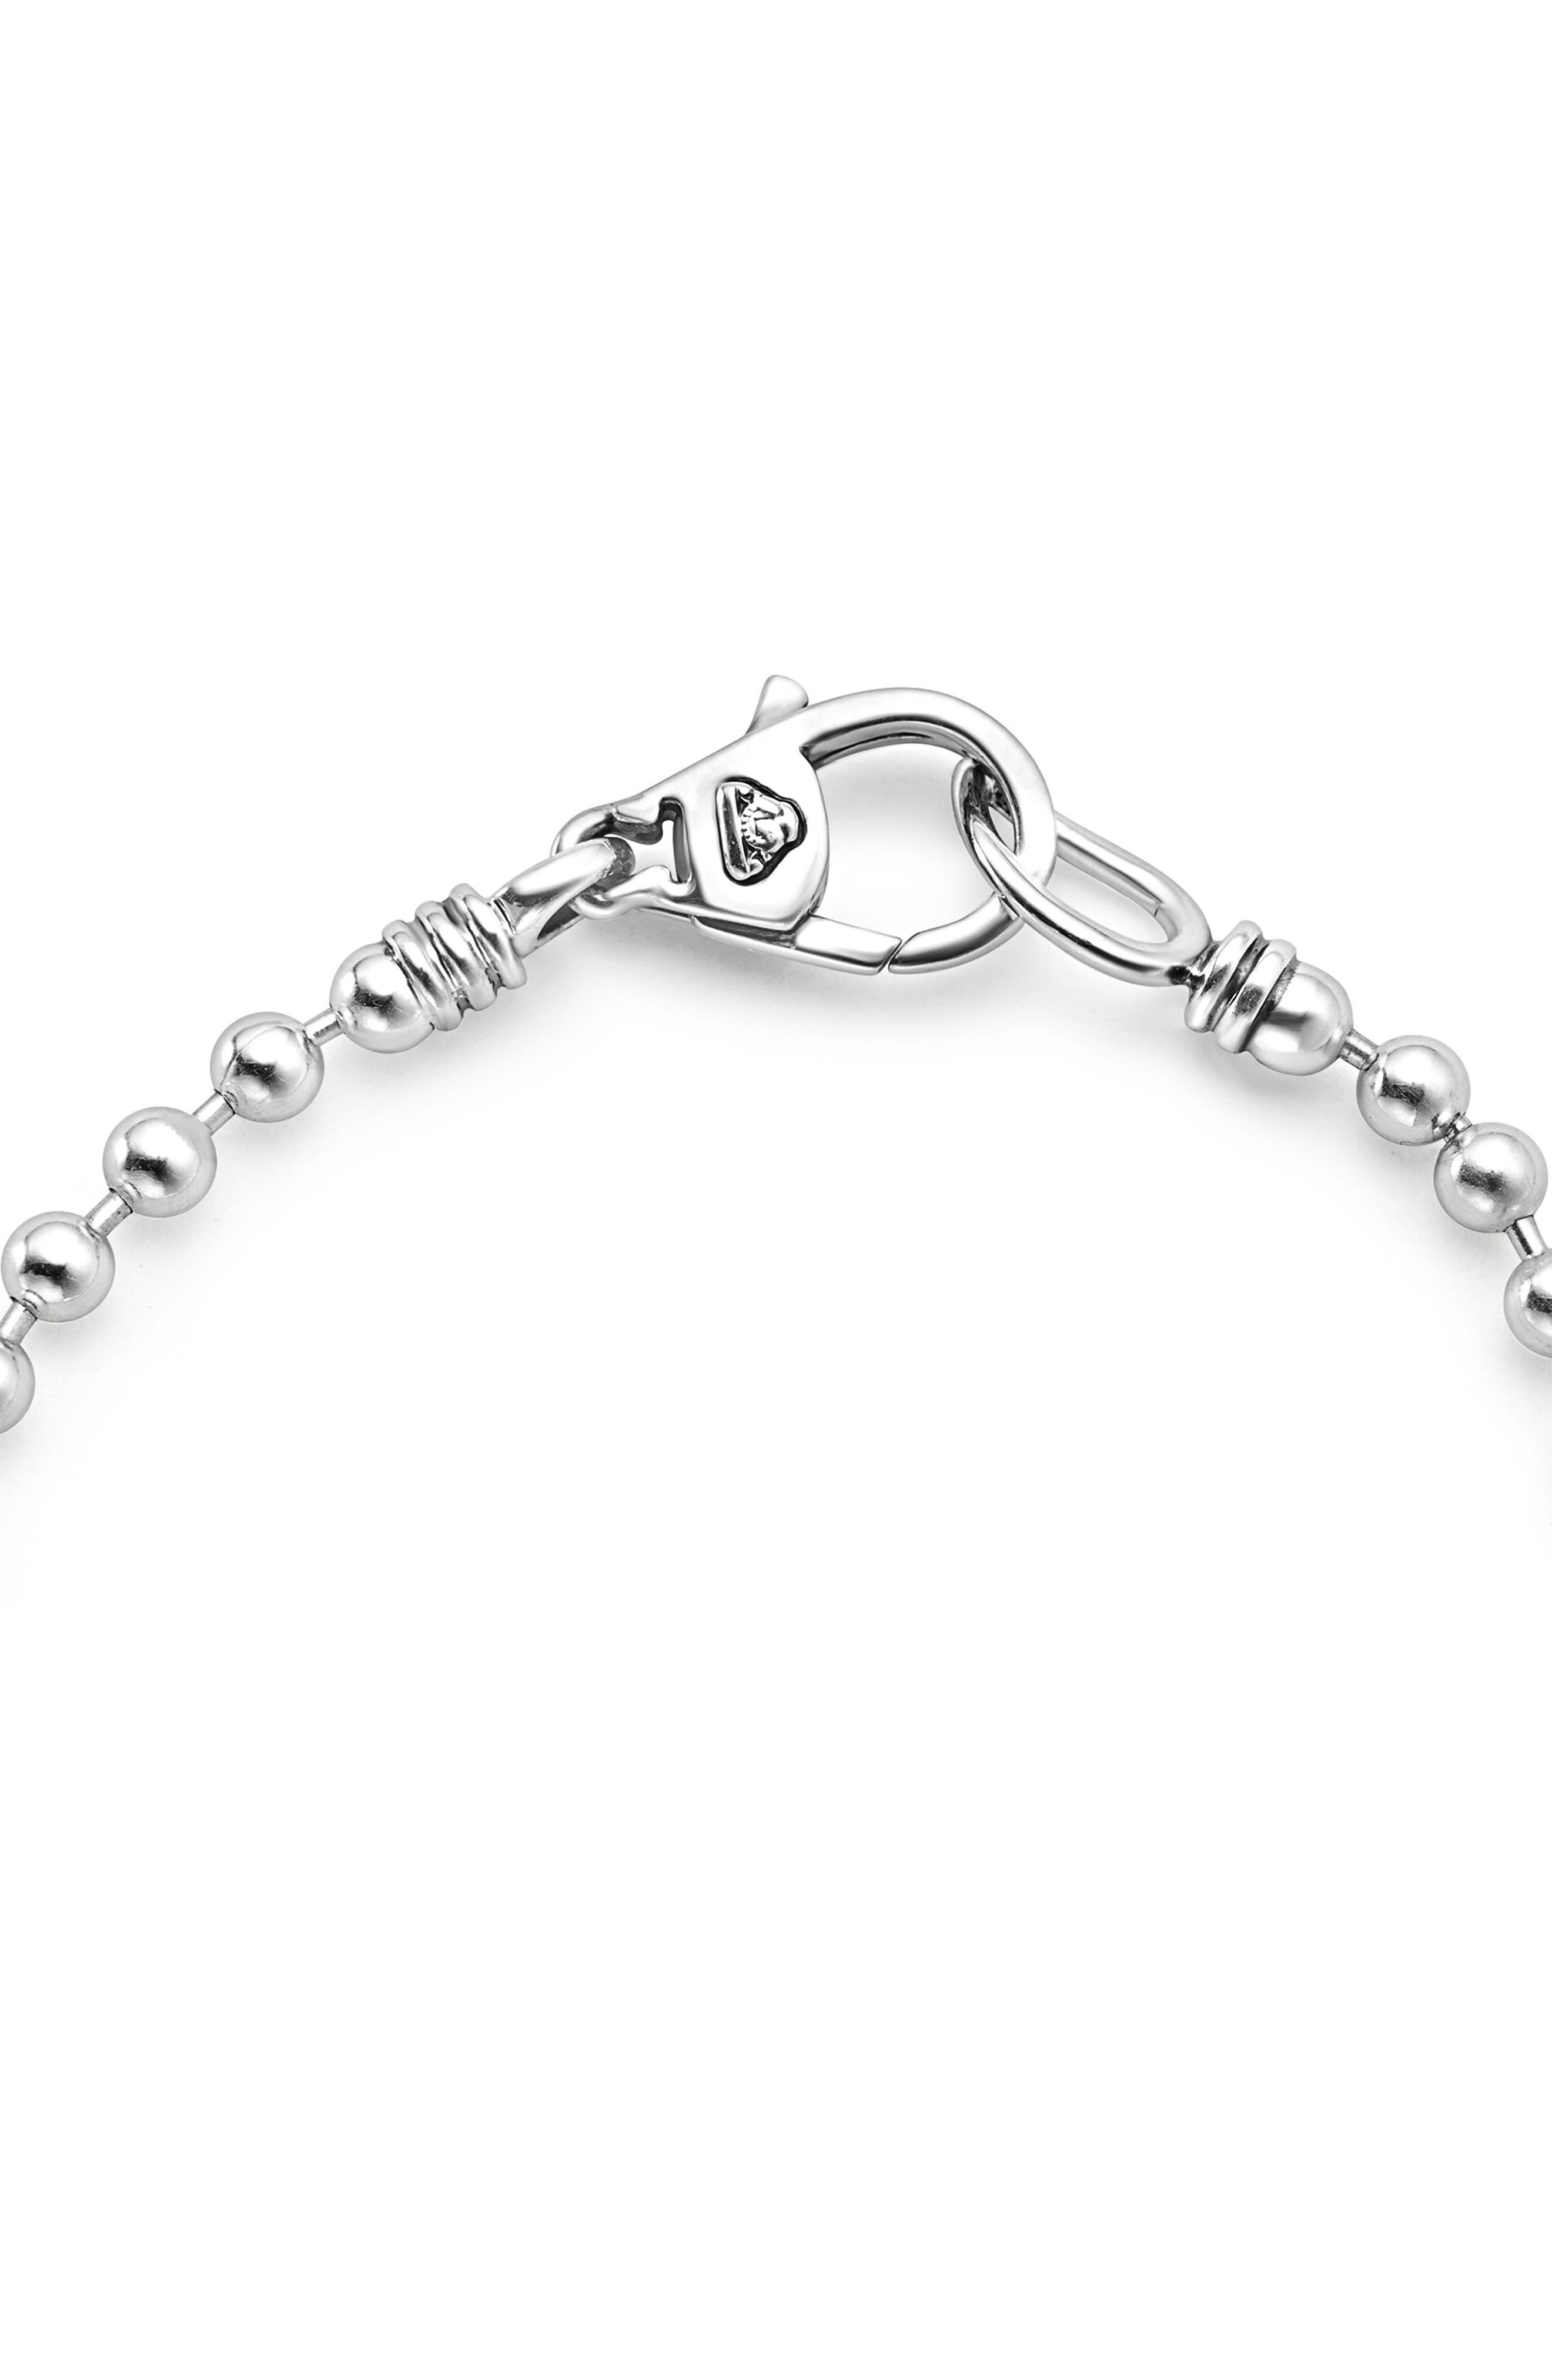 Caviar Spark Diamond Bracelet,                             Alternate thumbnail 2, color,                             Silver/ Diamond